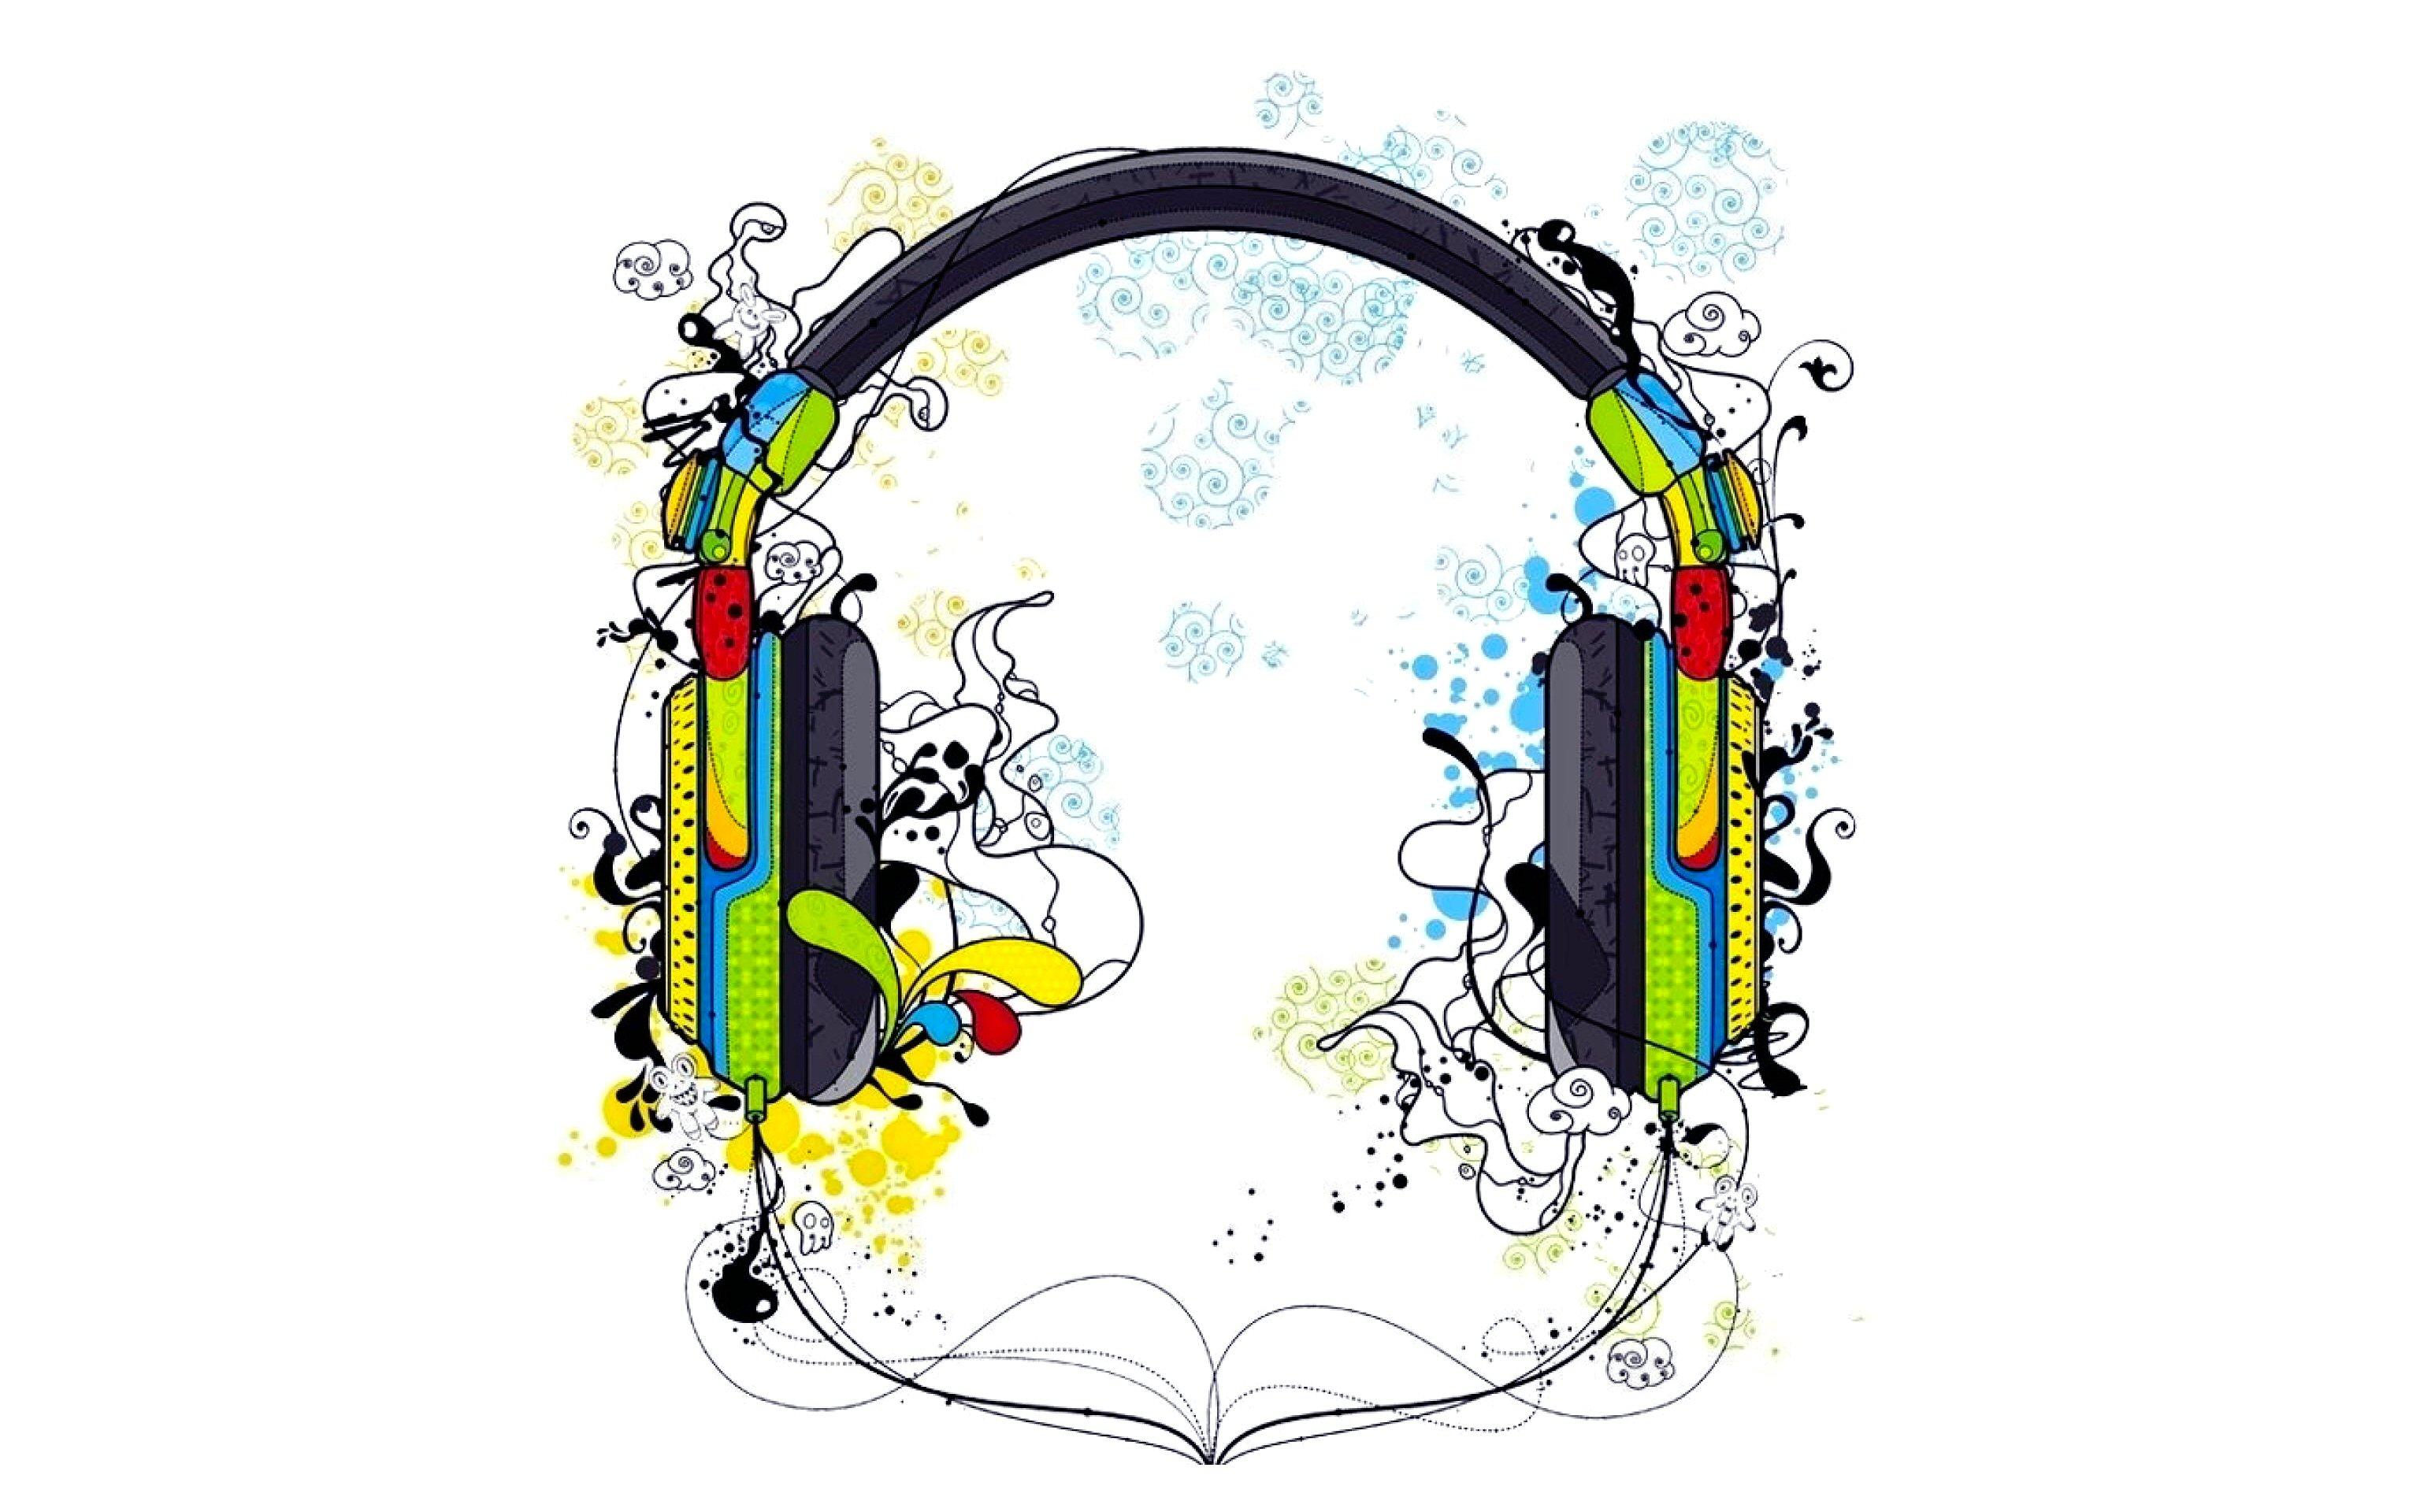 Beats clipart music headset Backgrounds ID:321021 Background HD Wallpaper